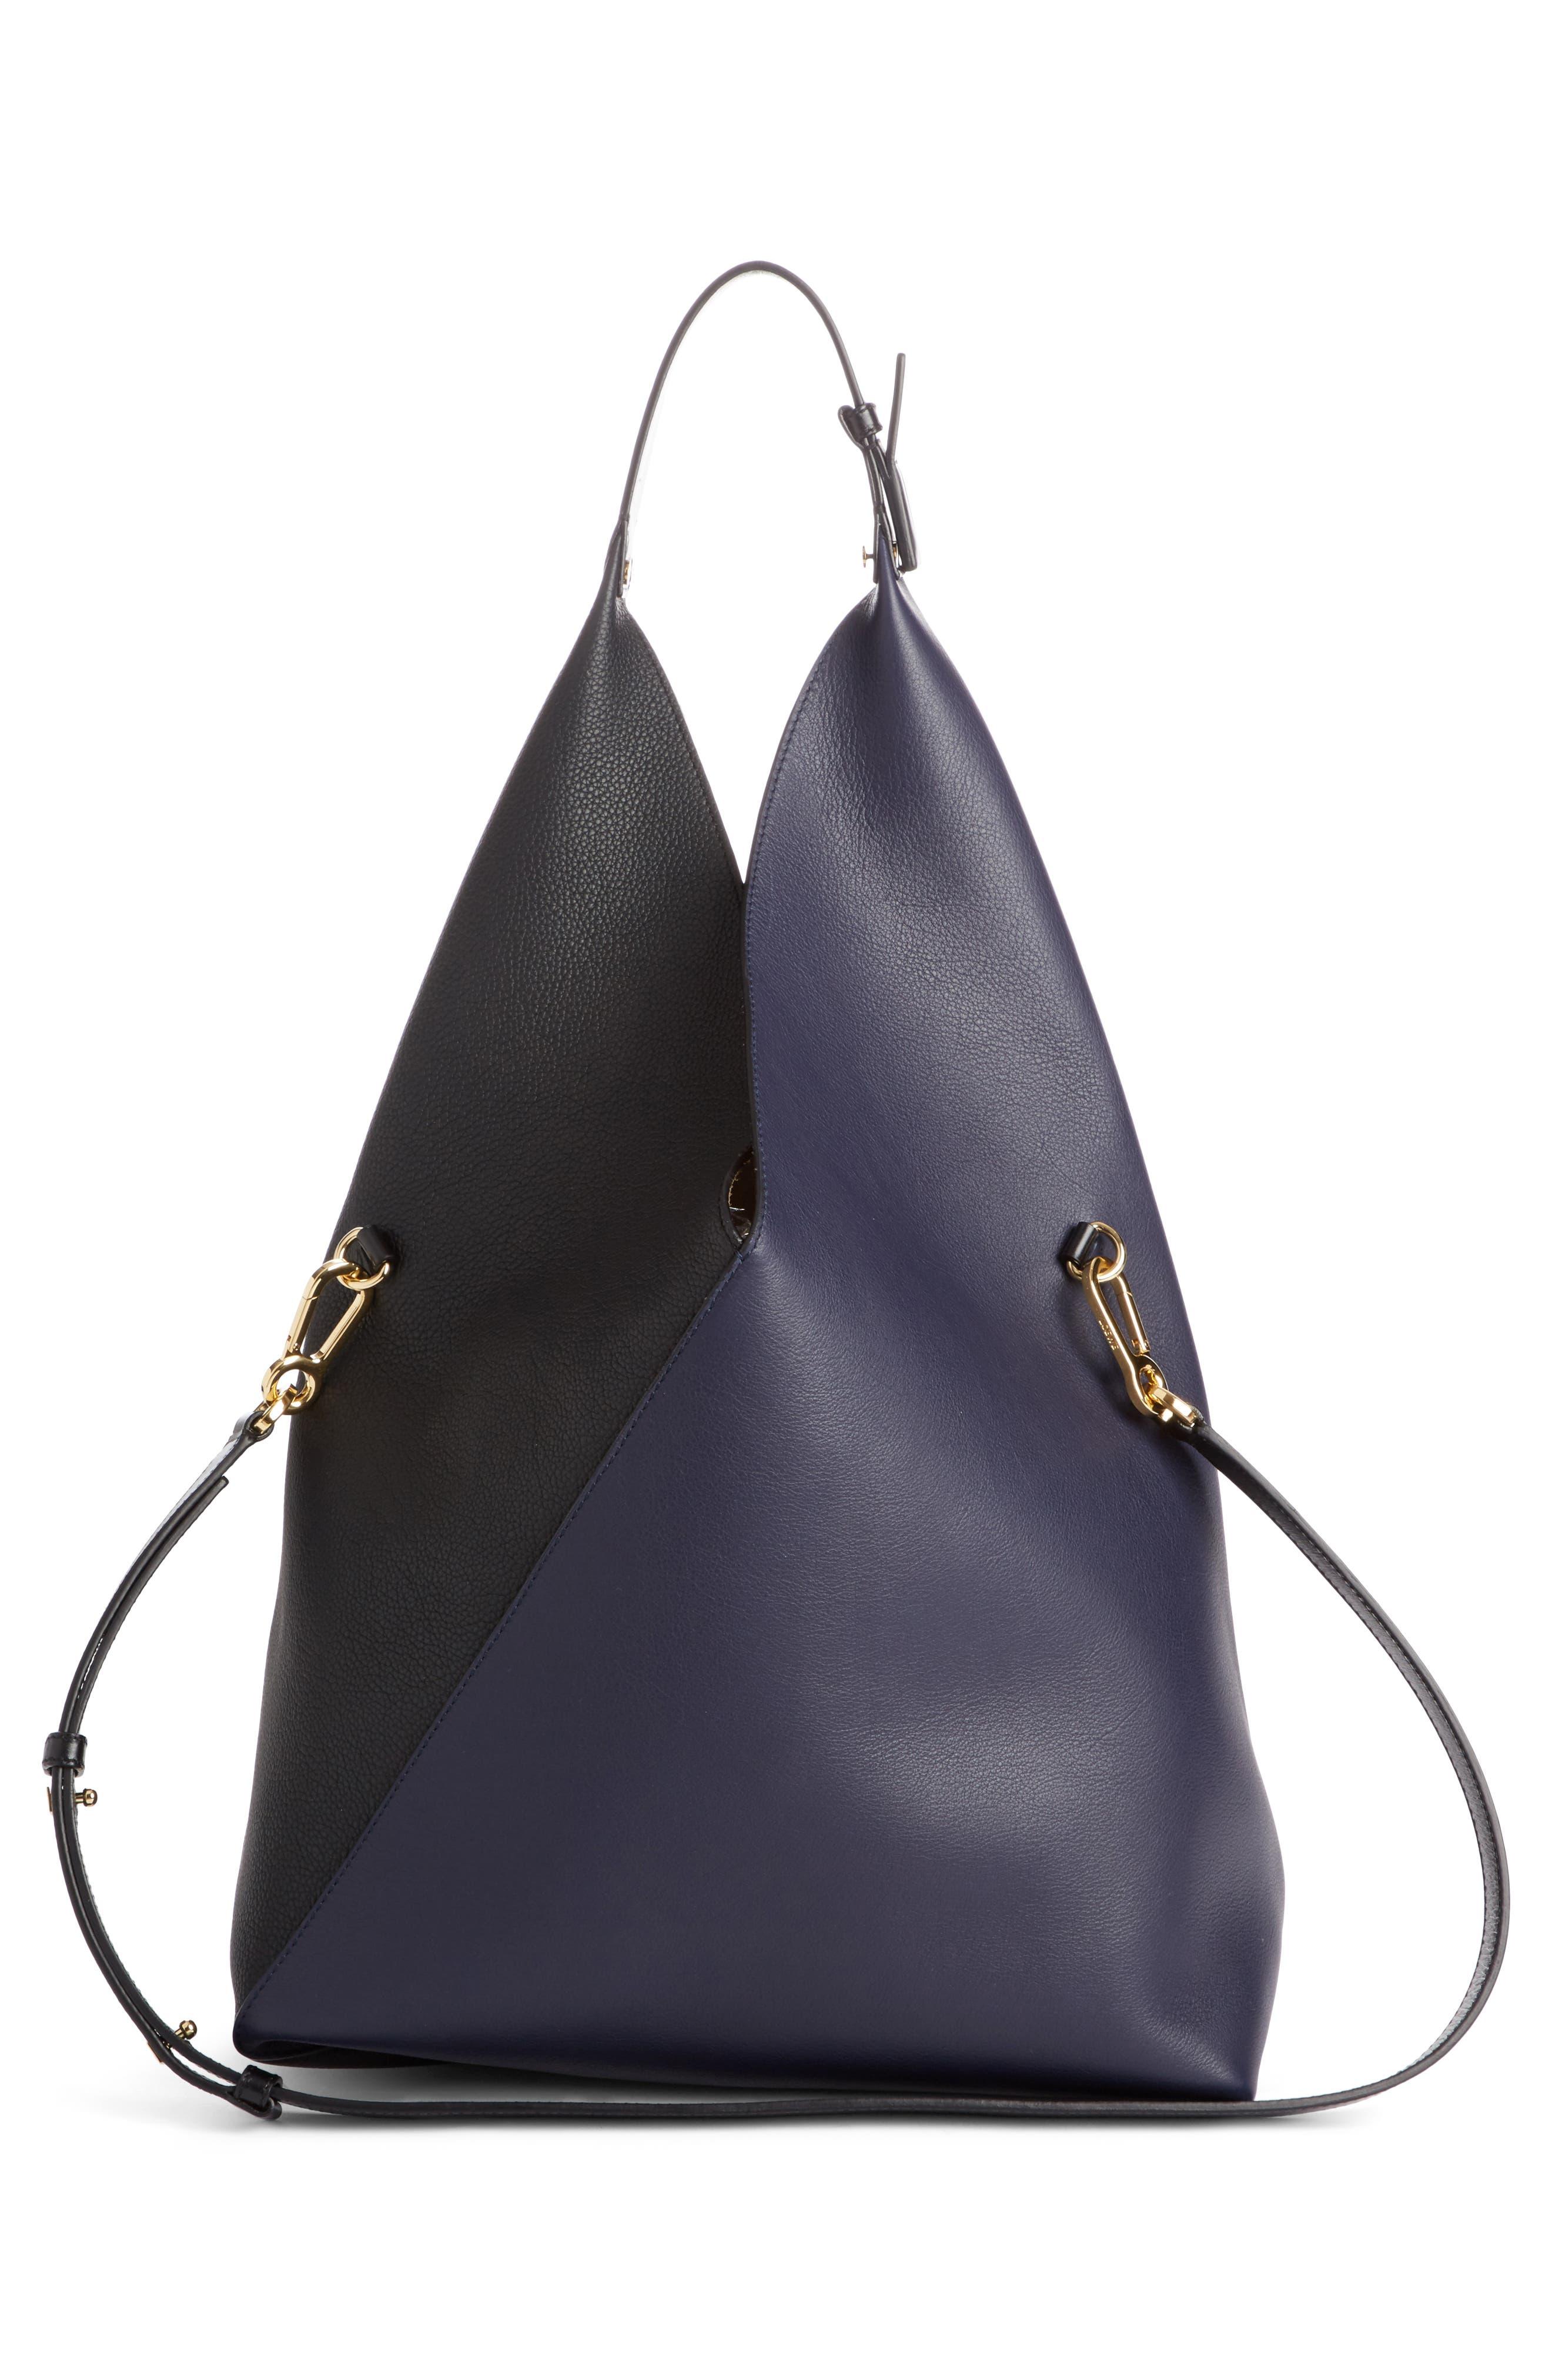 Calfskin Leather Sling Bag,                             Alternate thumbnail 2, color,                             Midnight Blue/ Black